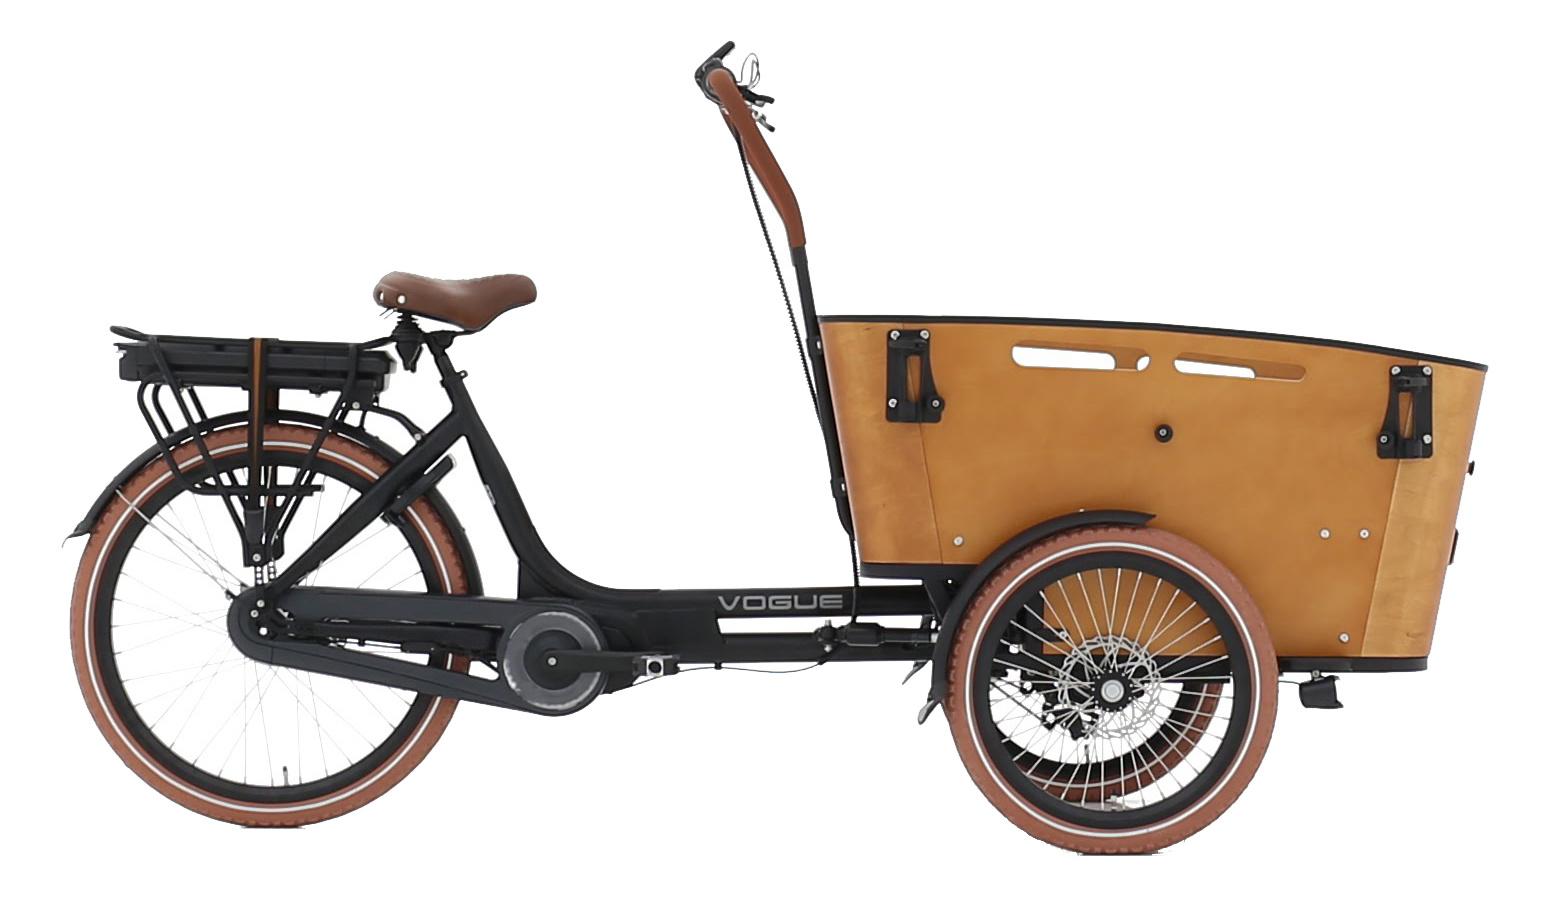 Vogue Carry 3 Dames 48cm Matt Black/Brown 7V online kopen